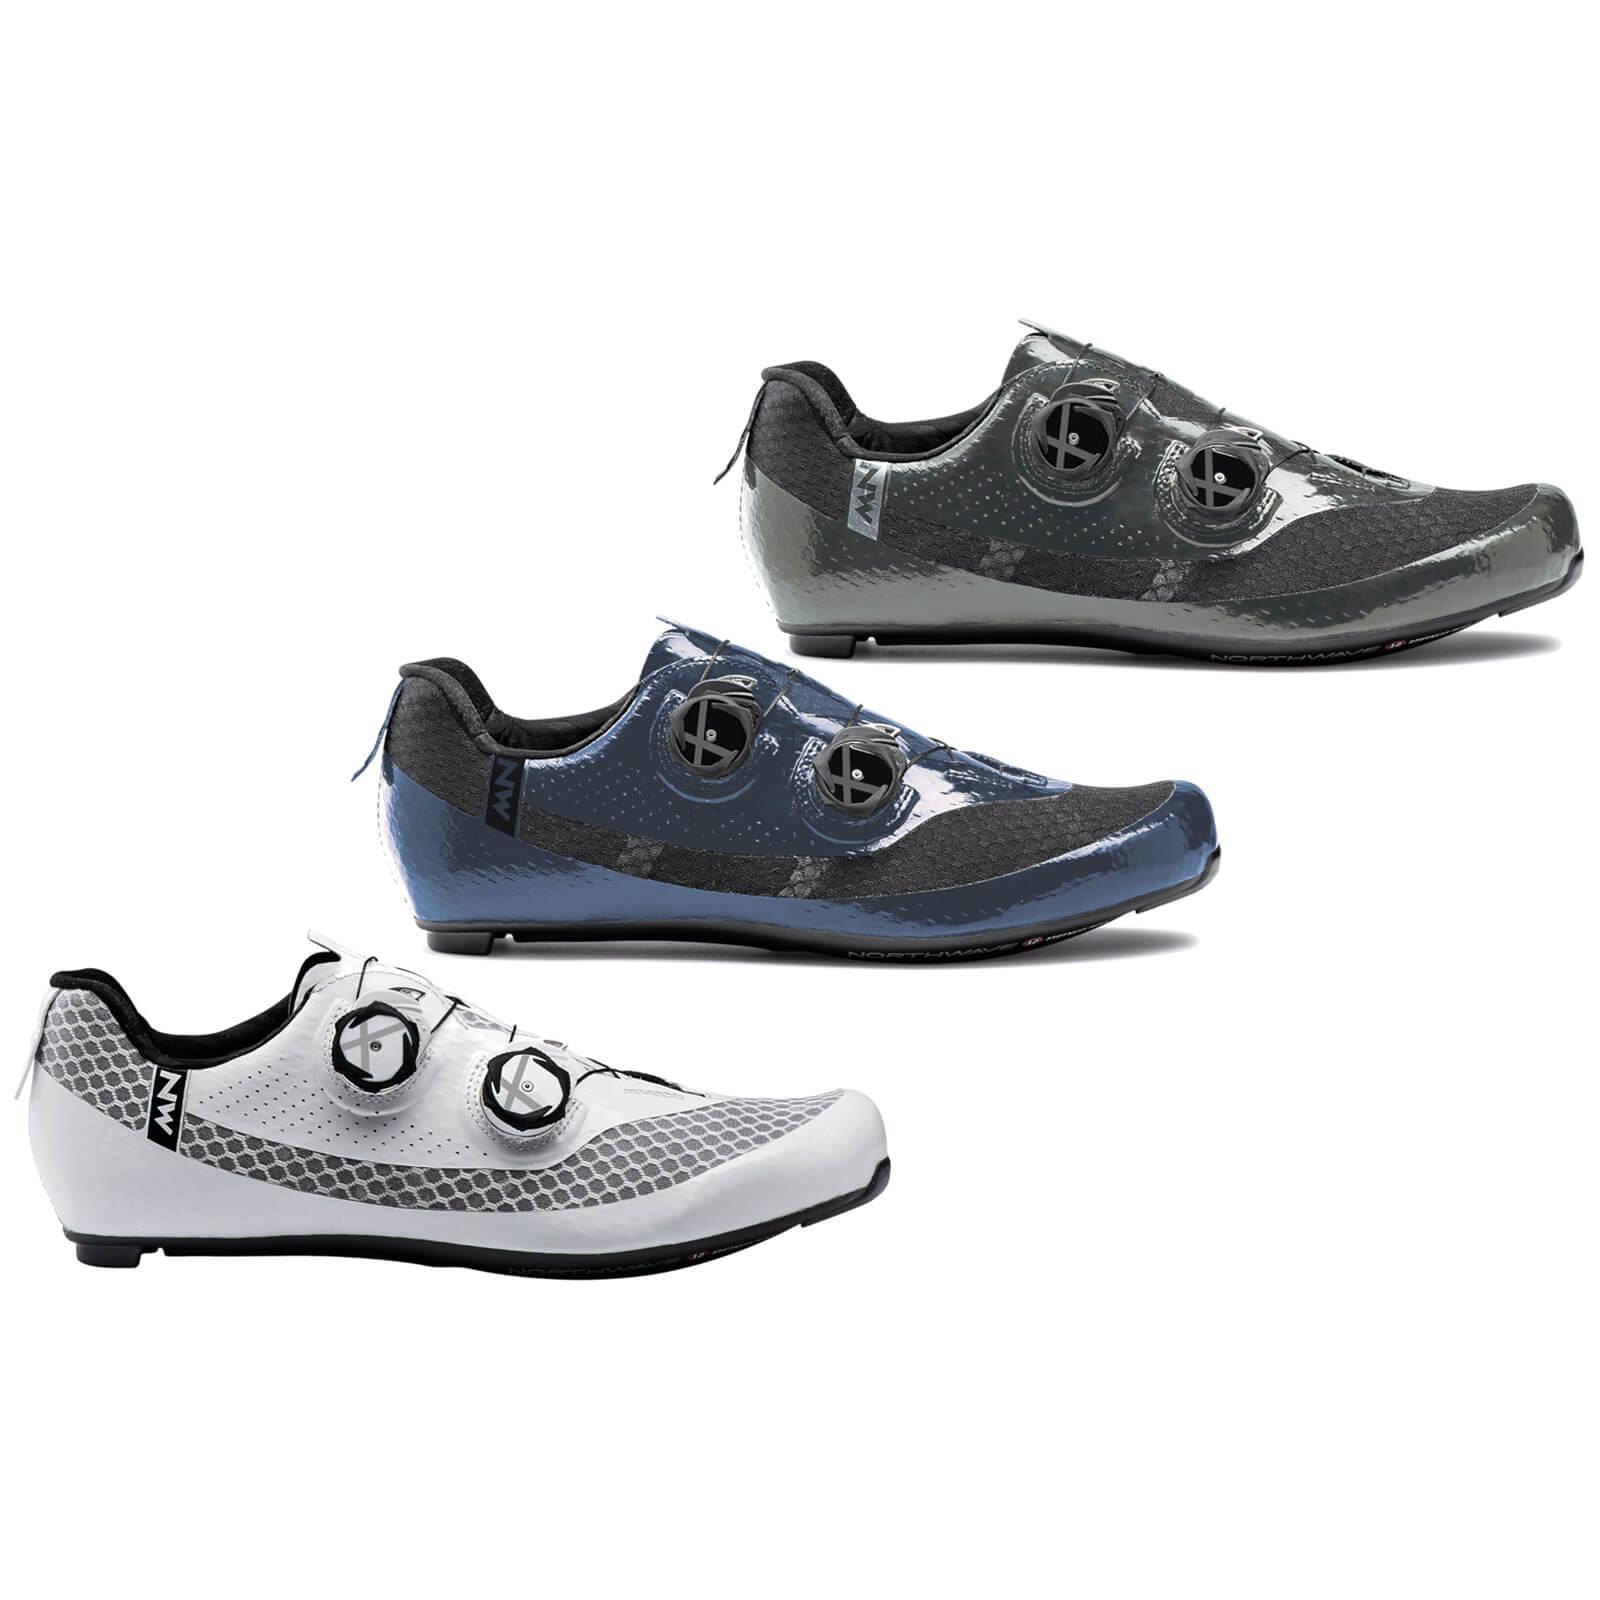 Image of Northwave Mistral Plus Road Shoes - 2021 - Metal Anthracite / EU45